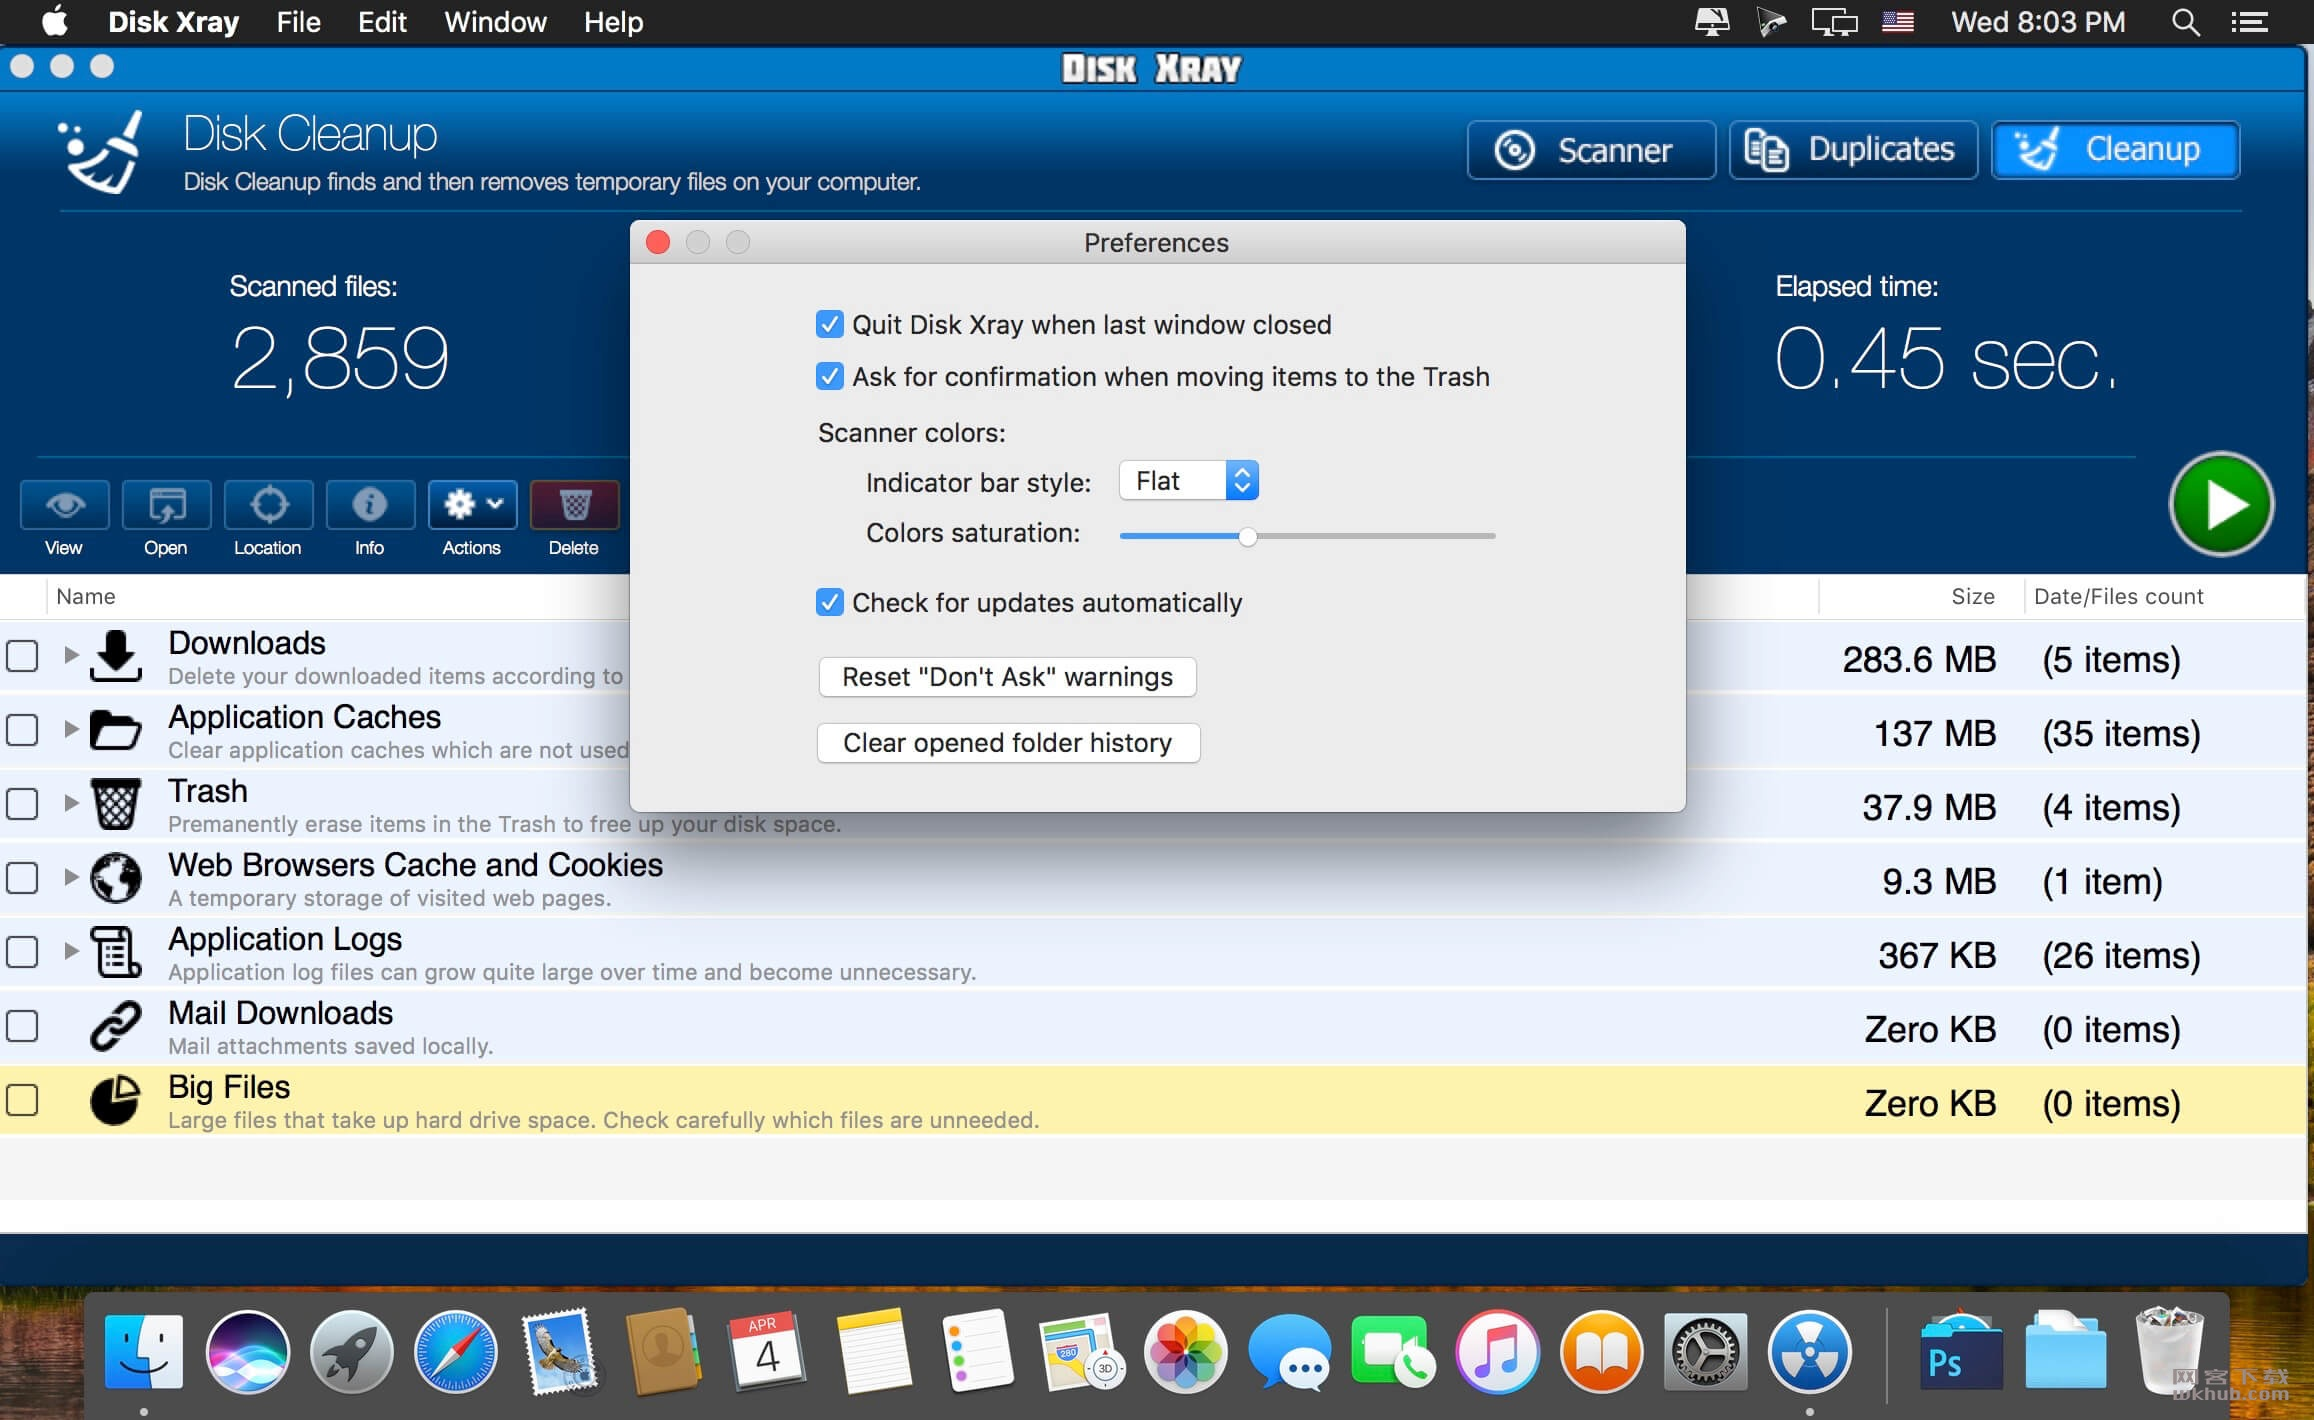 Disk Xray 2.7.27021 磁盘信息统计工具